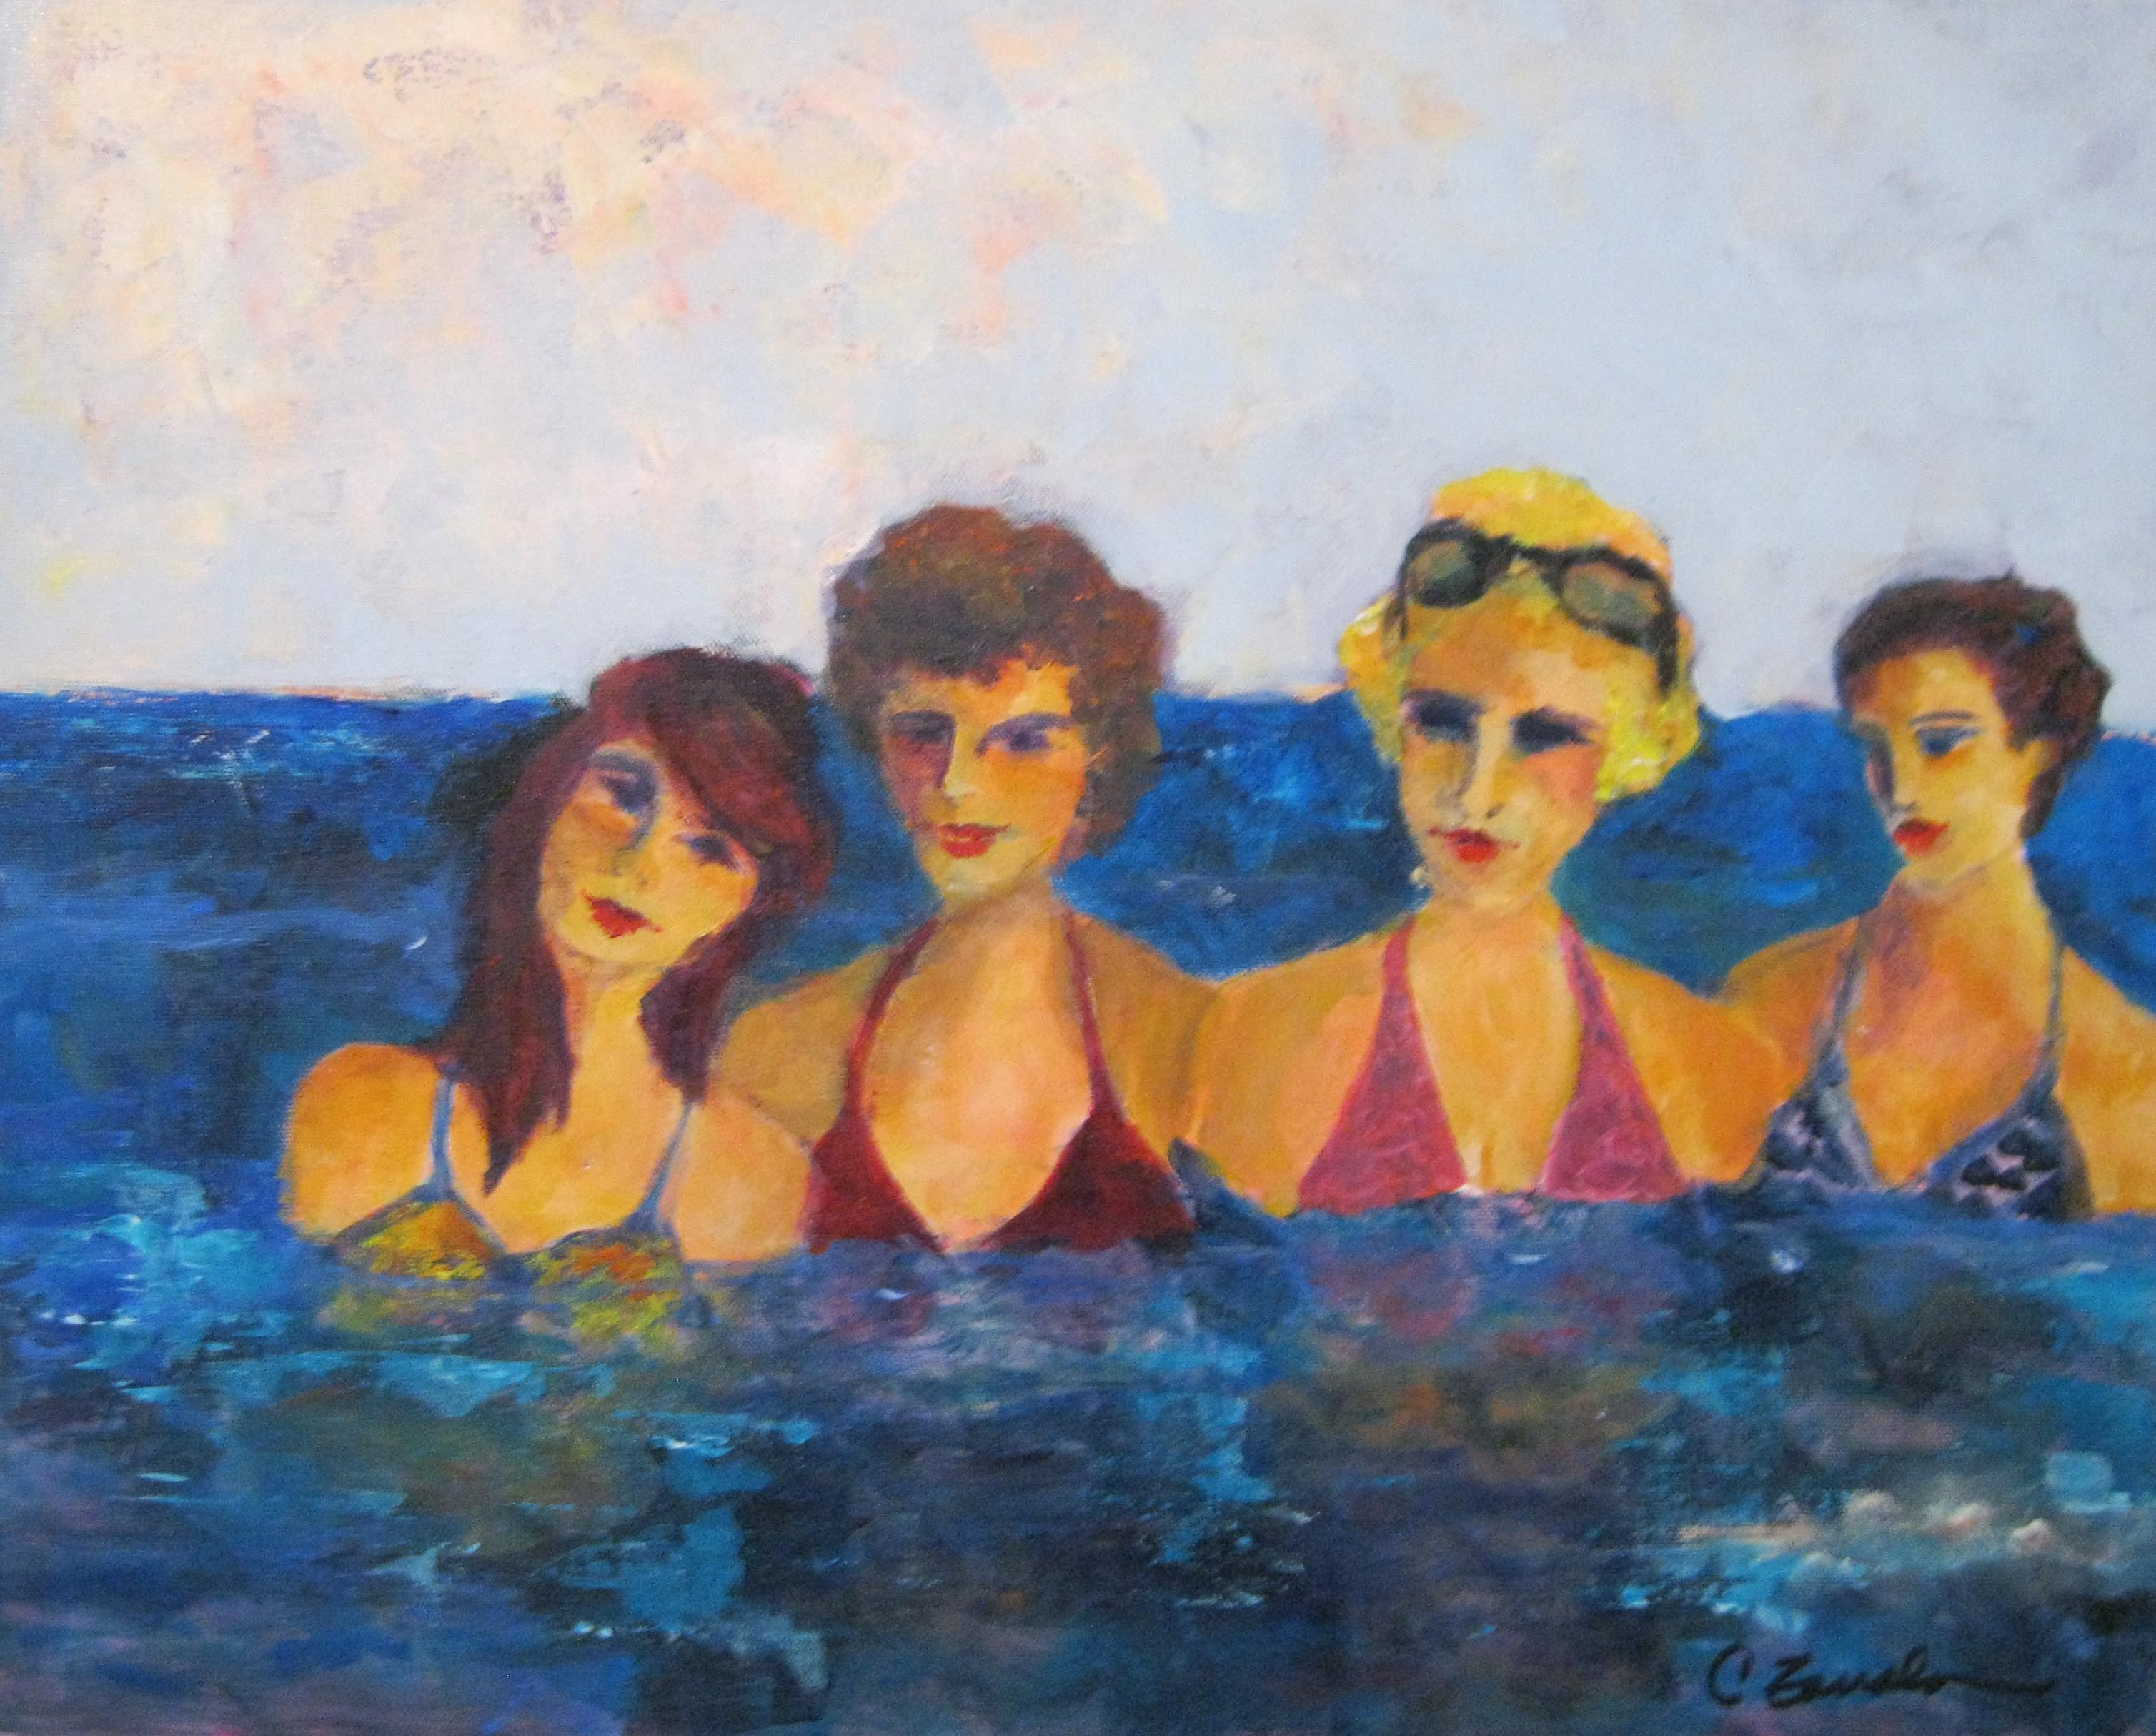 Les Girls of Laguna